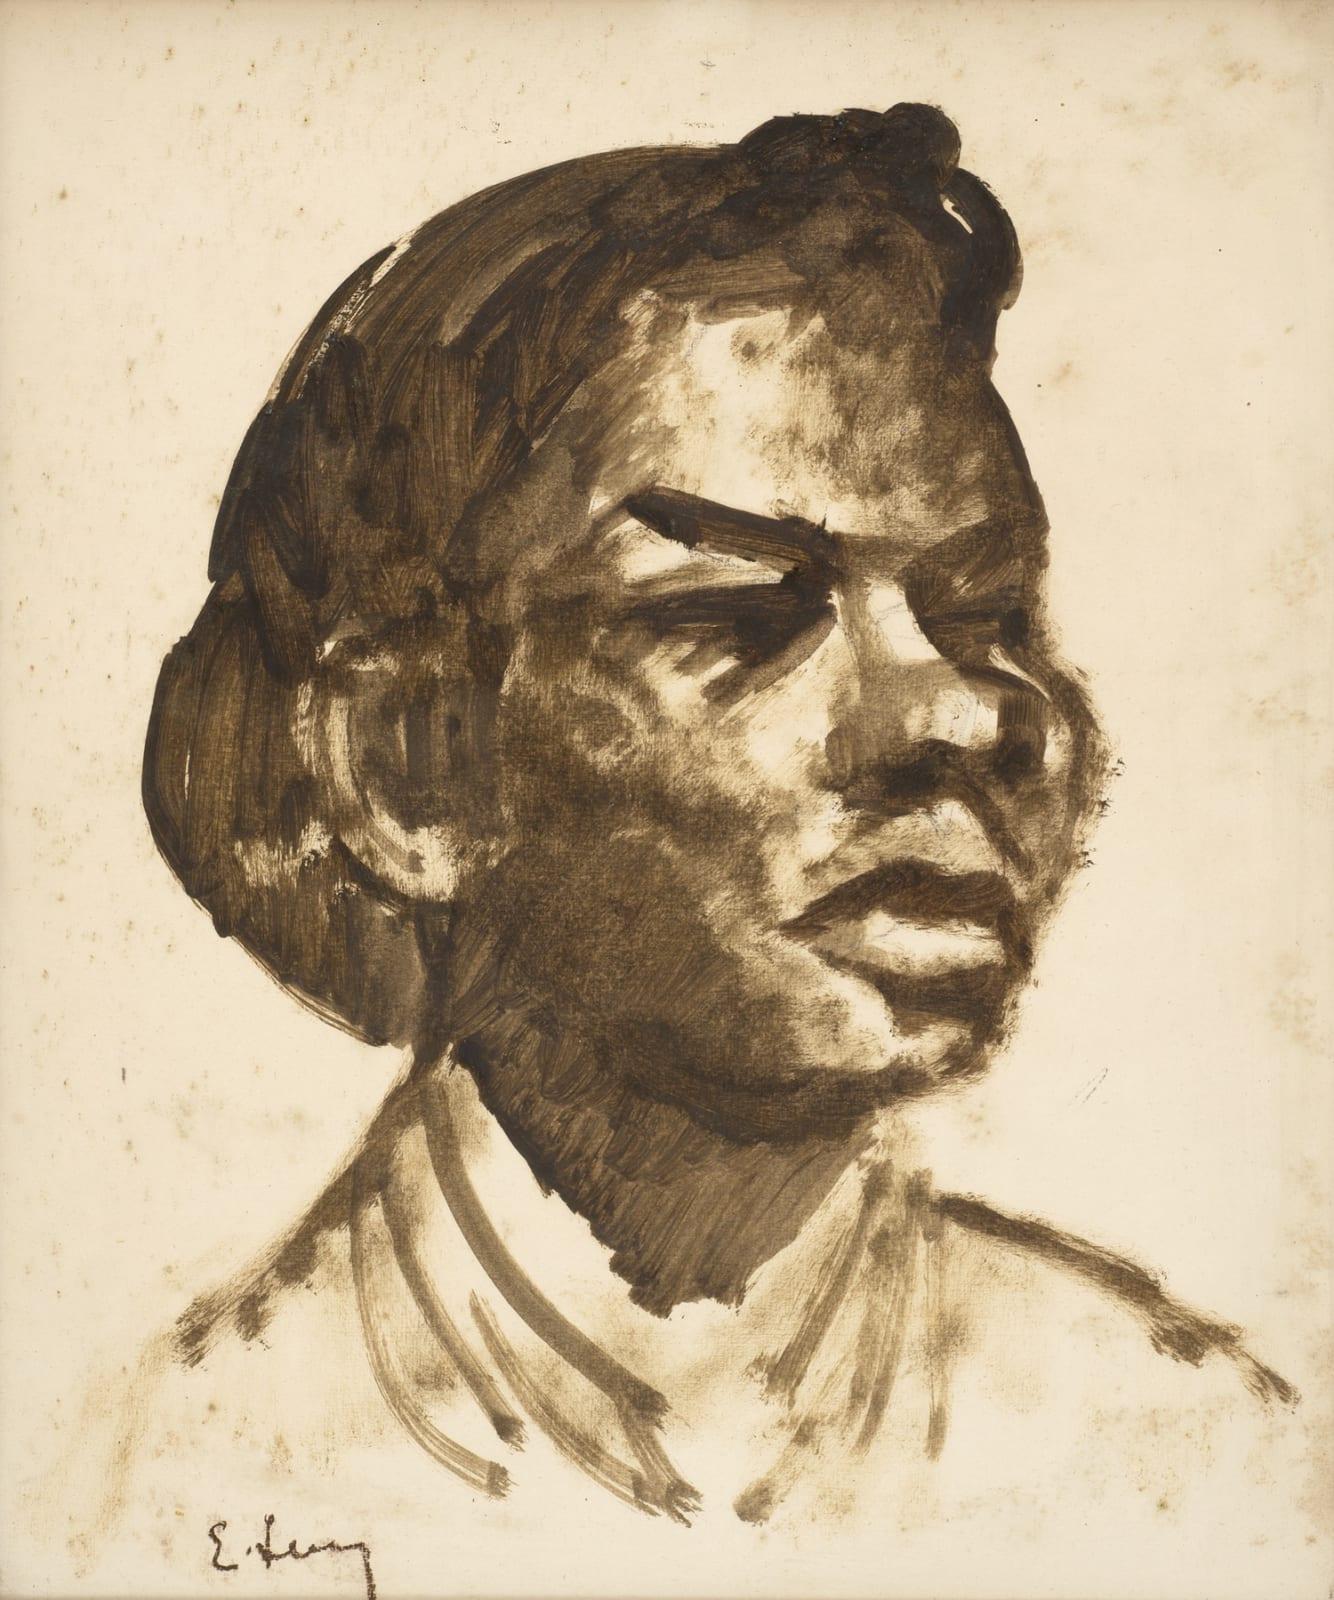 Emmanuel Levy (1900-1986) Head of a Girl n.d. Pencil and gouache on paper 44.2 x 37 cm Ben Uri Collection © Emmanuel Levy estate